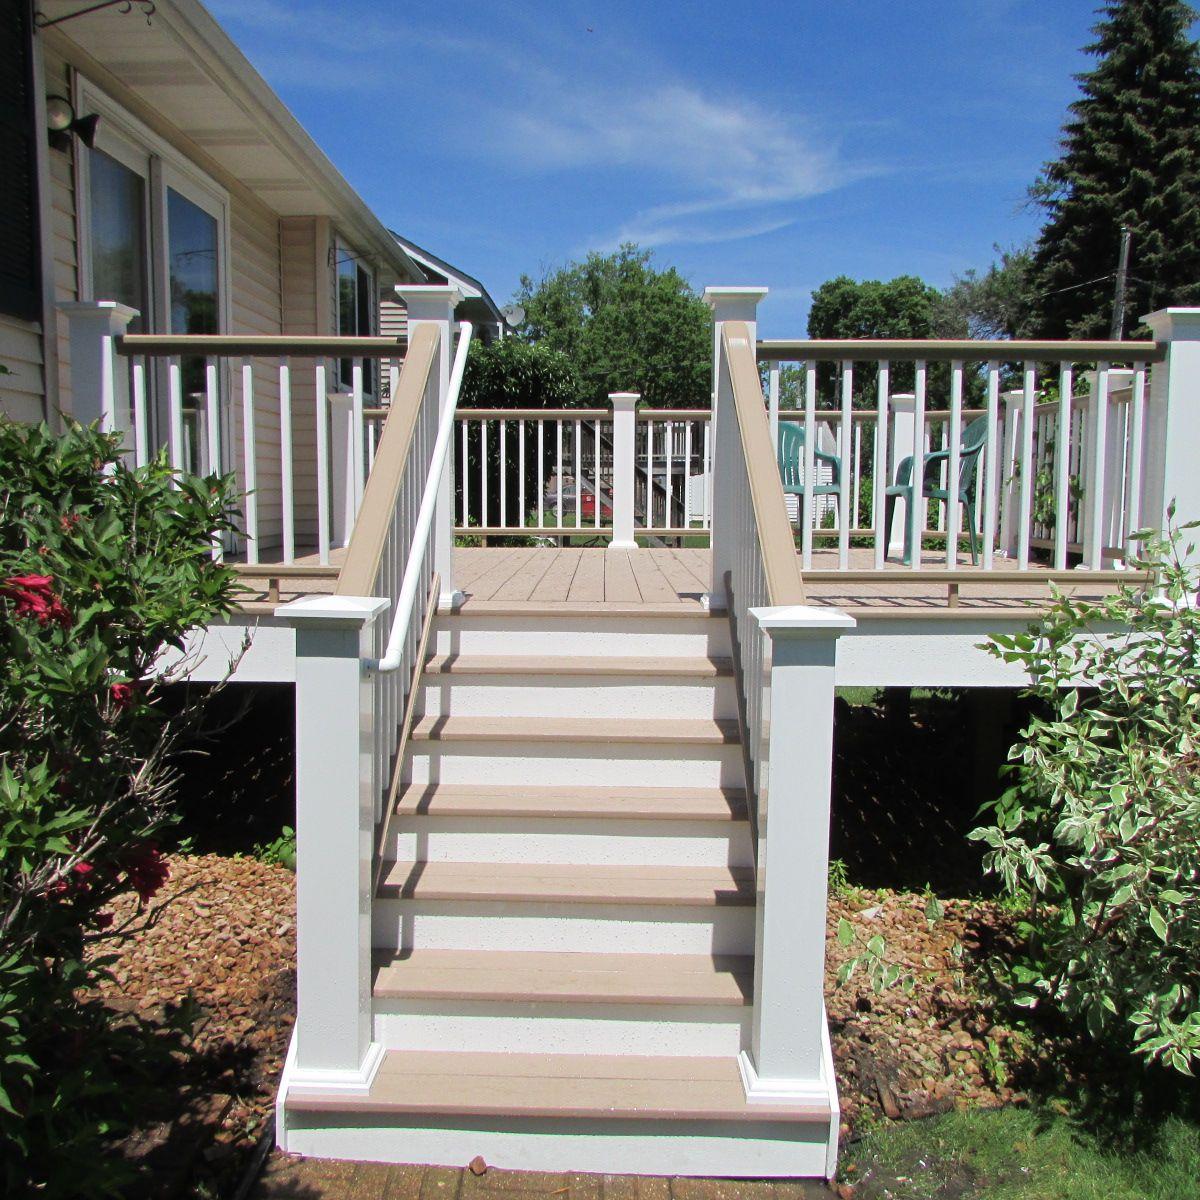 TimberTech Deck with White Railing | Deck, Timbertech